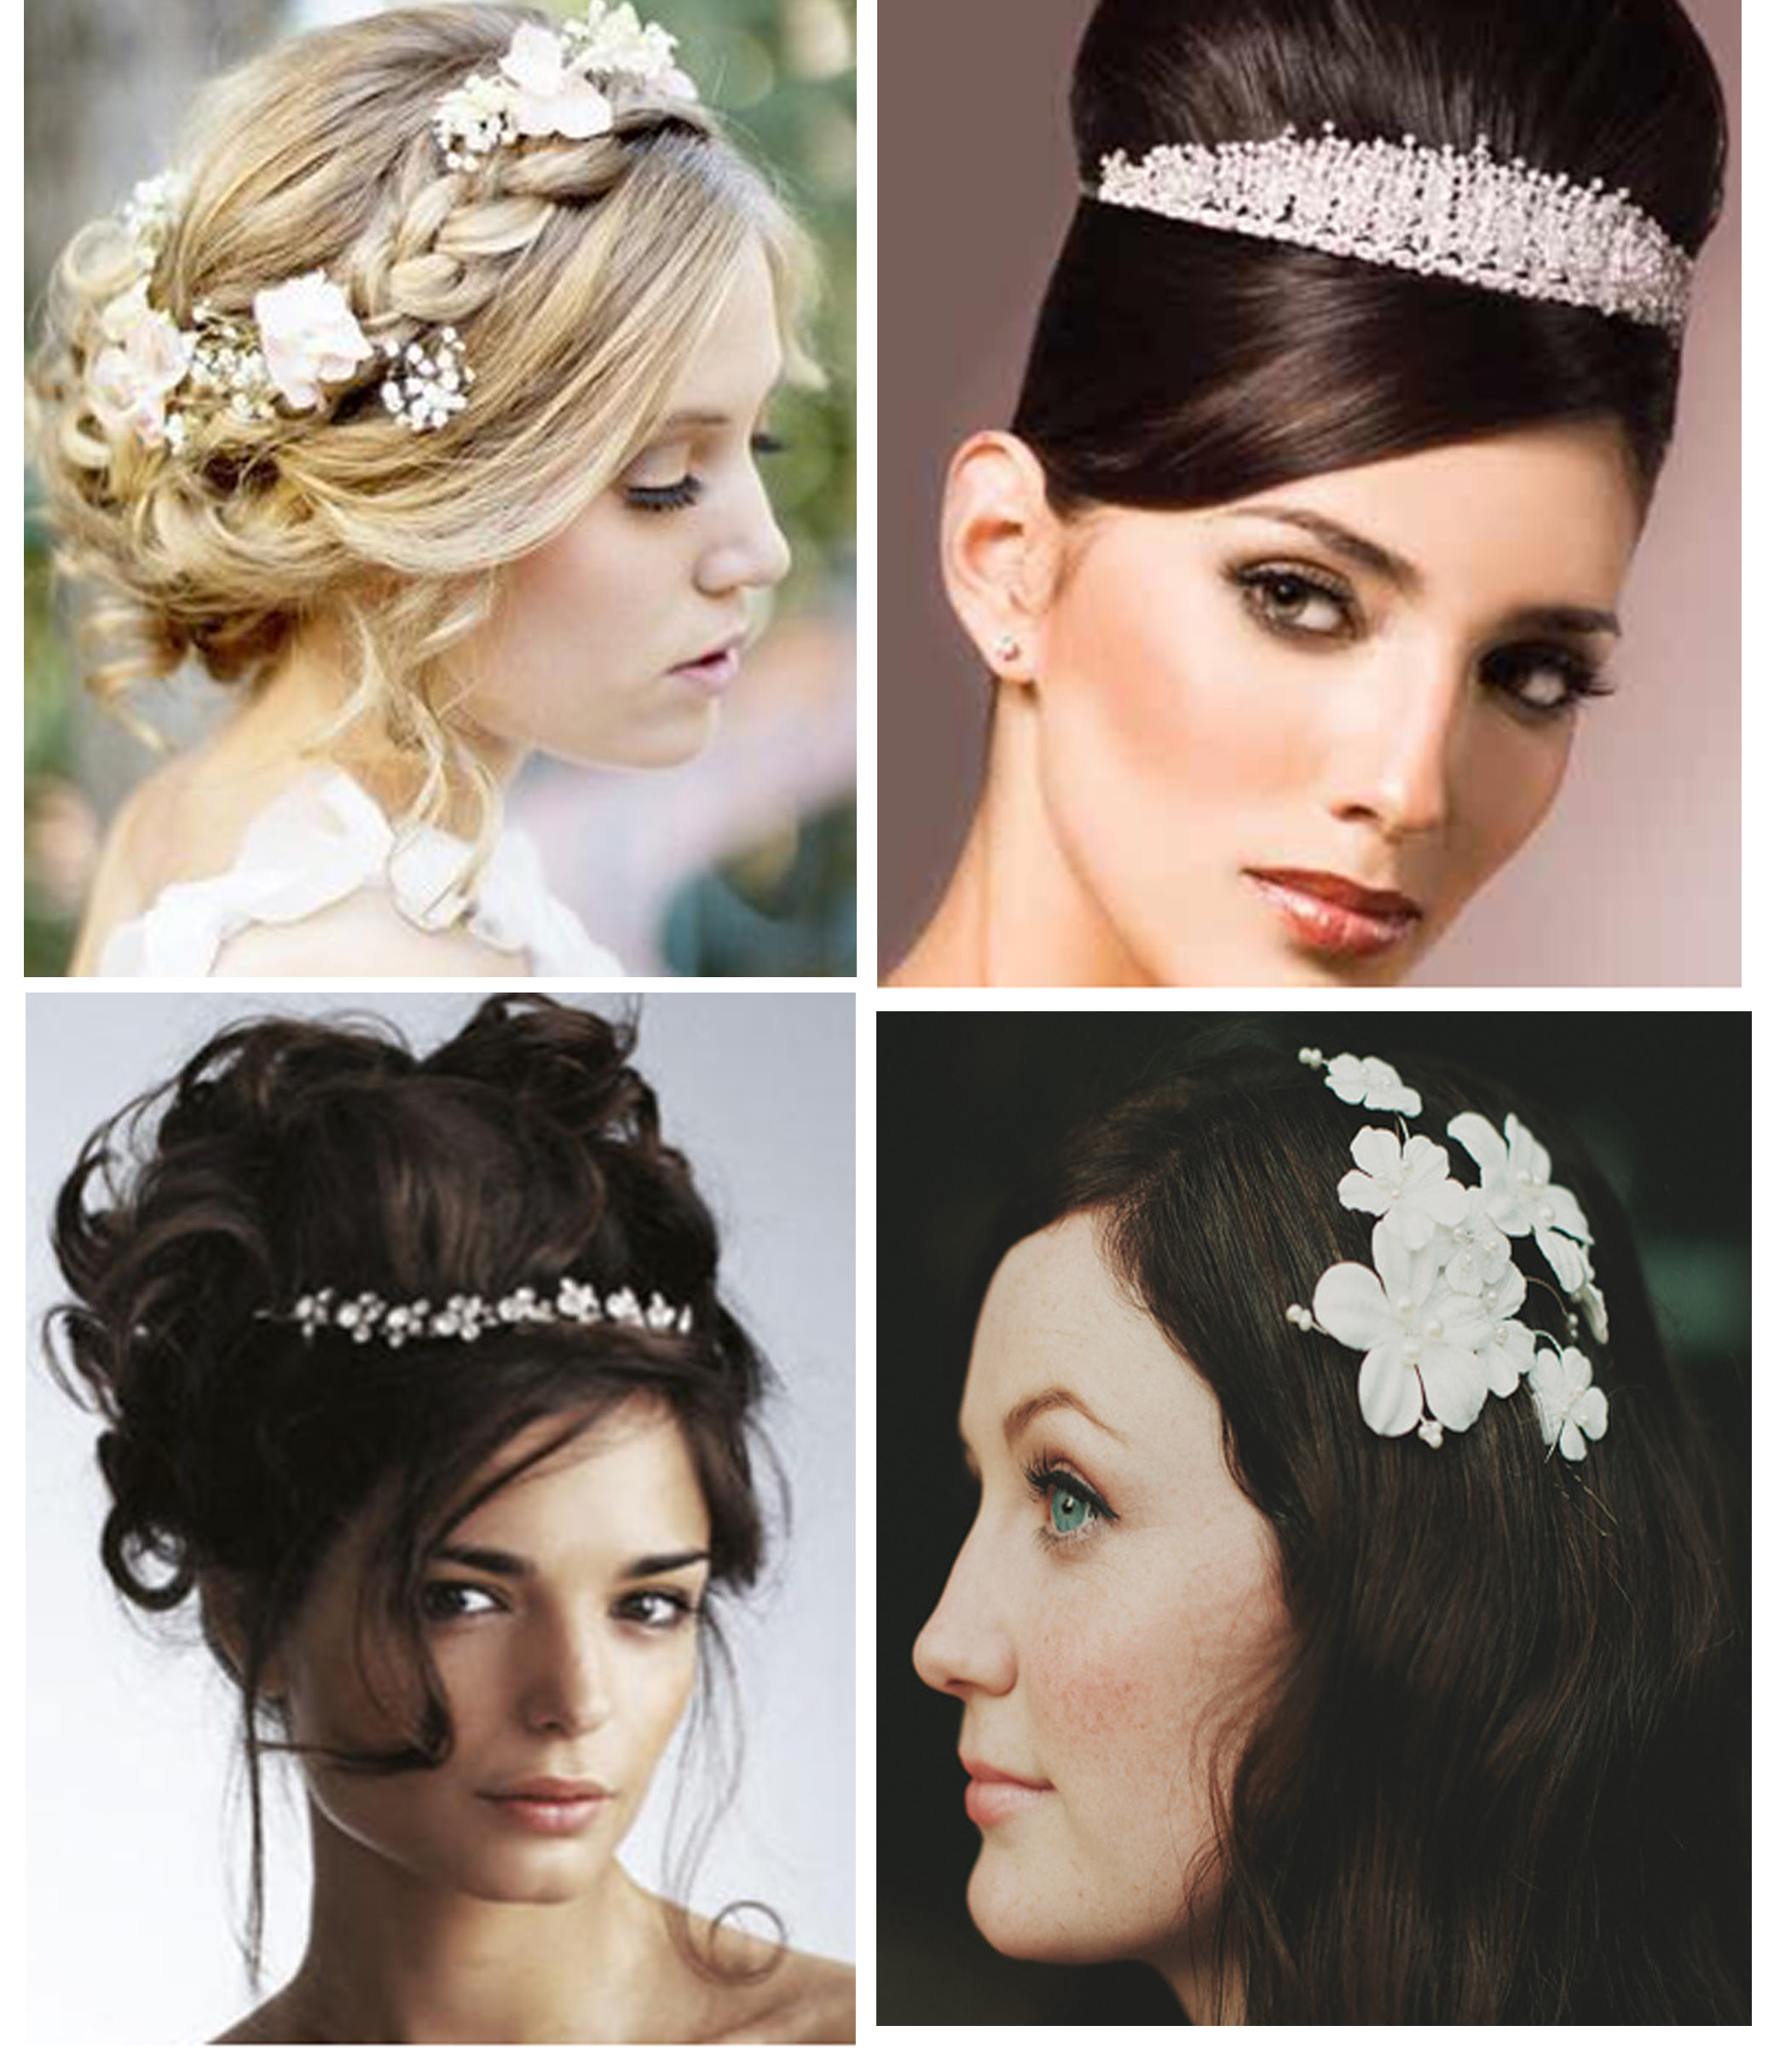 Style Rambut Pengantin Modern Sobfashion